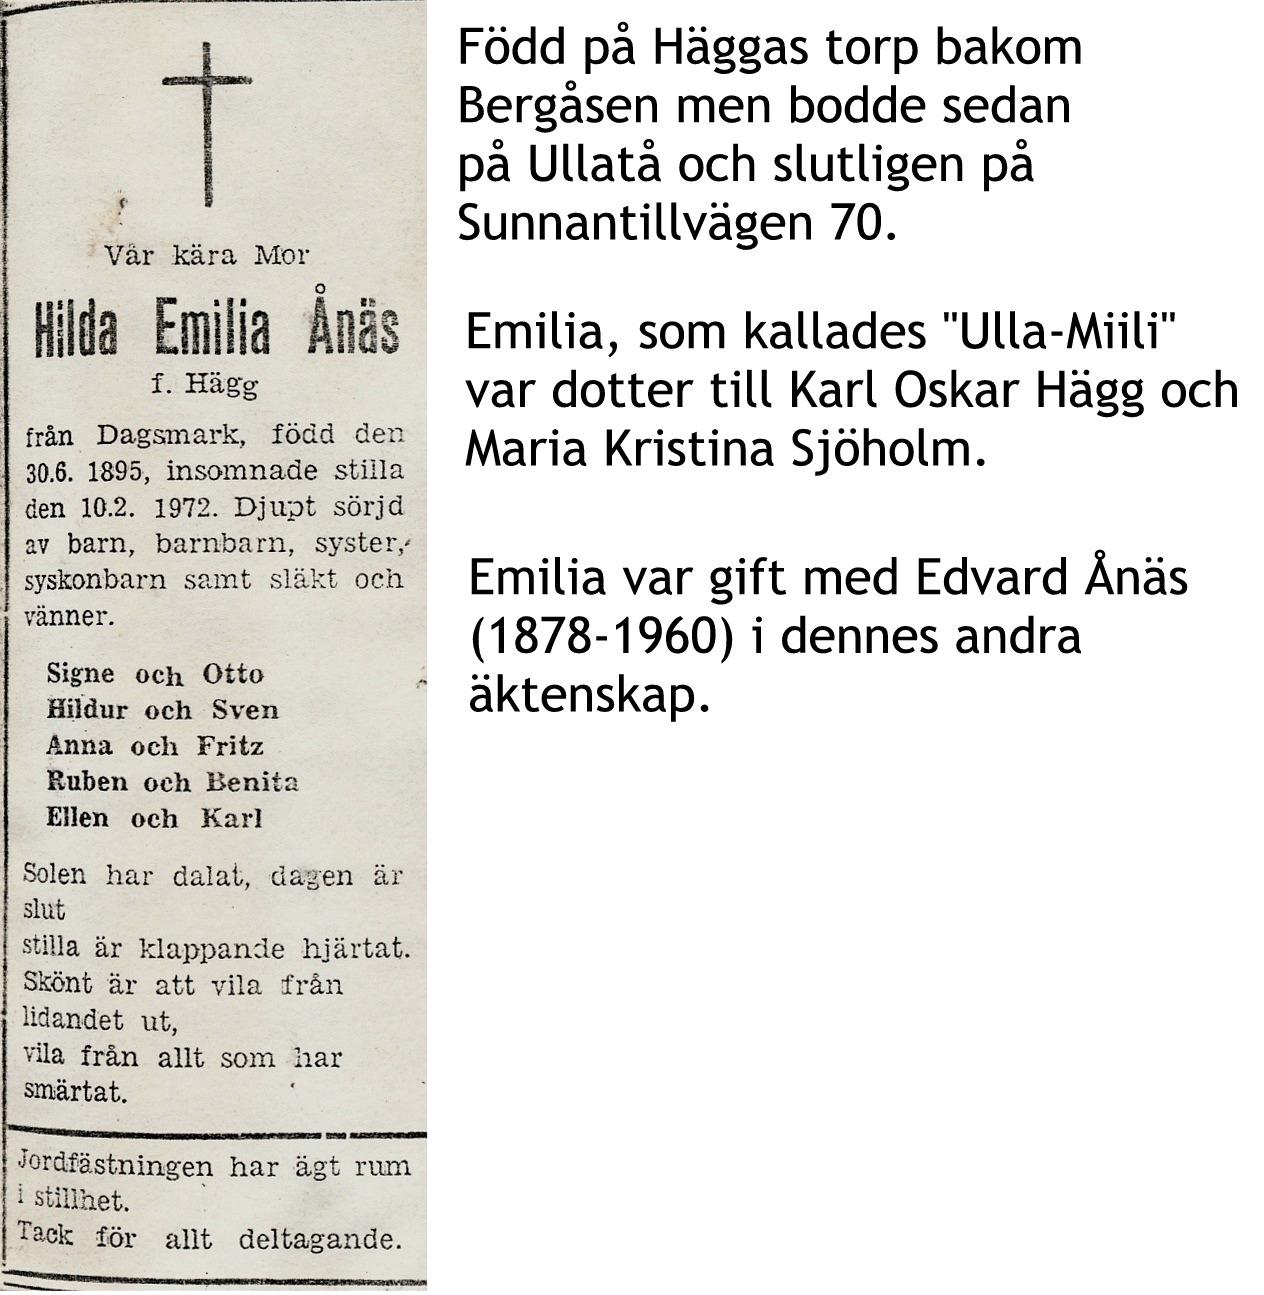 Ånäs Emilia